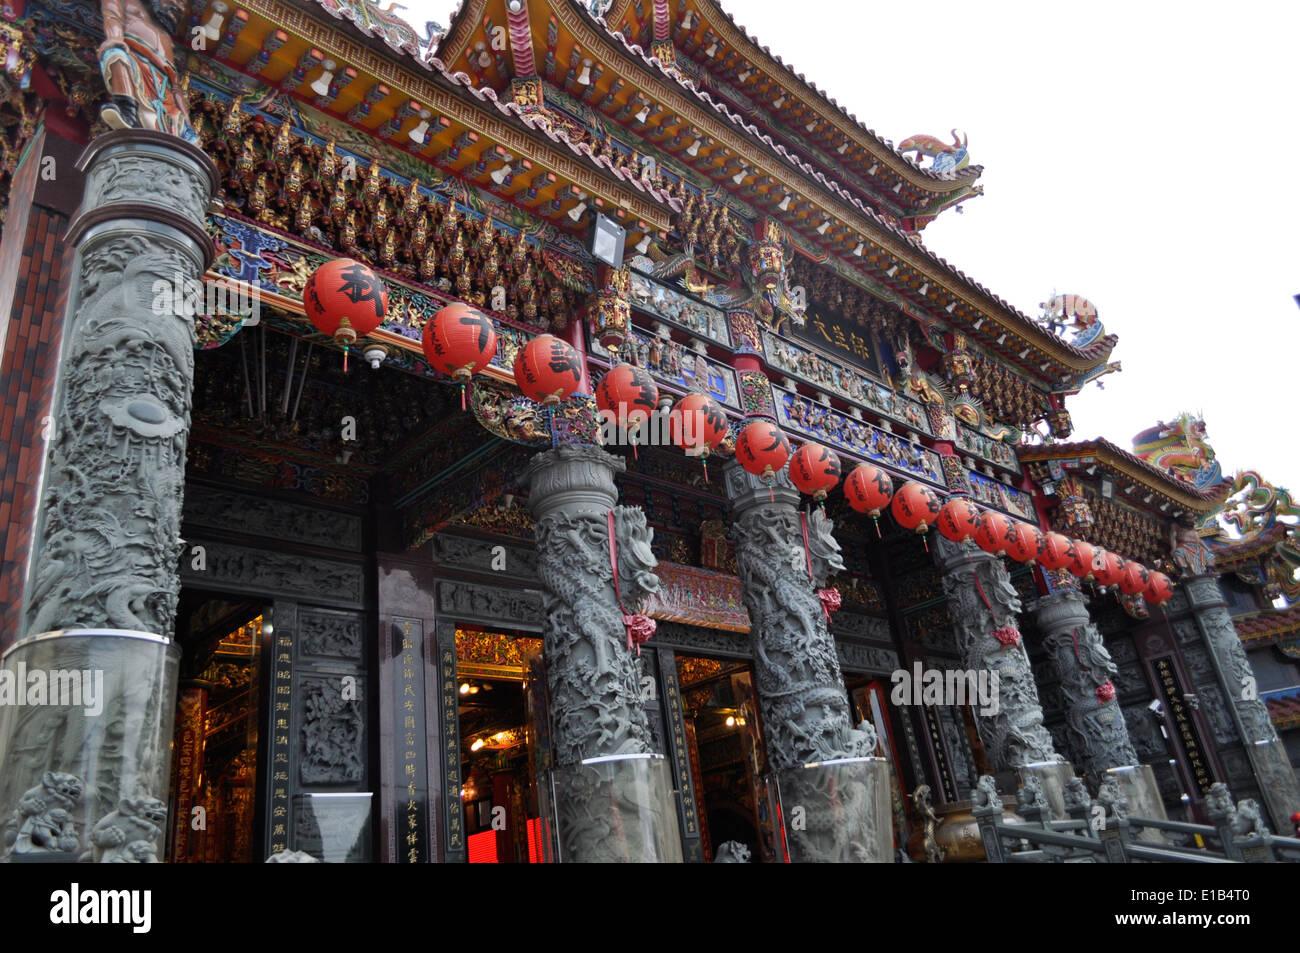 Cih Ji Palace, Kaohsiung, Taiwan - Stock Image